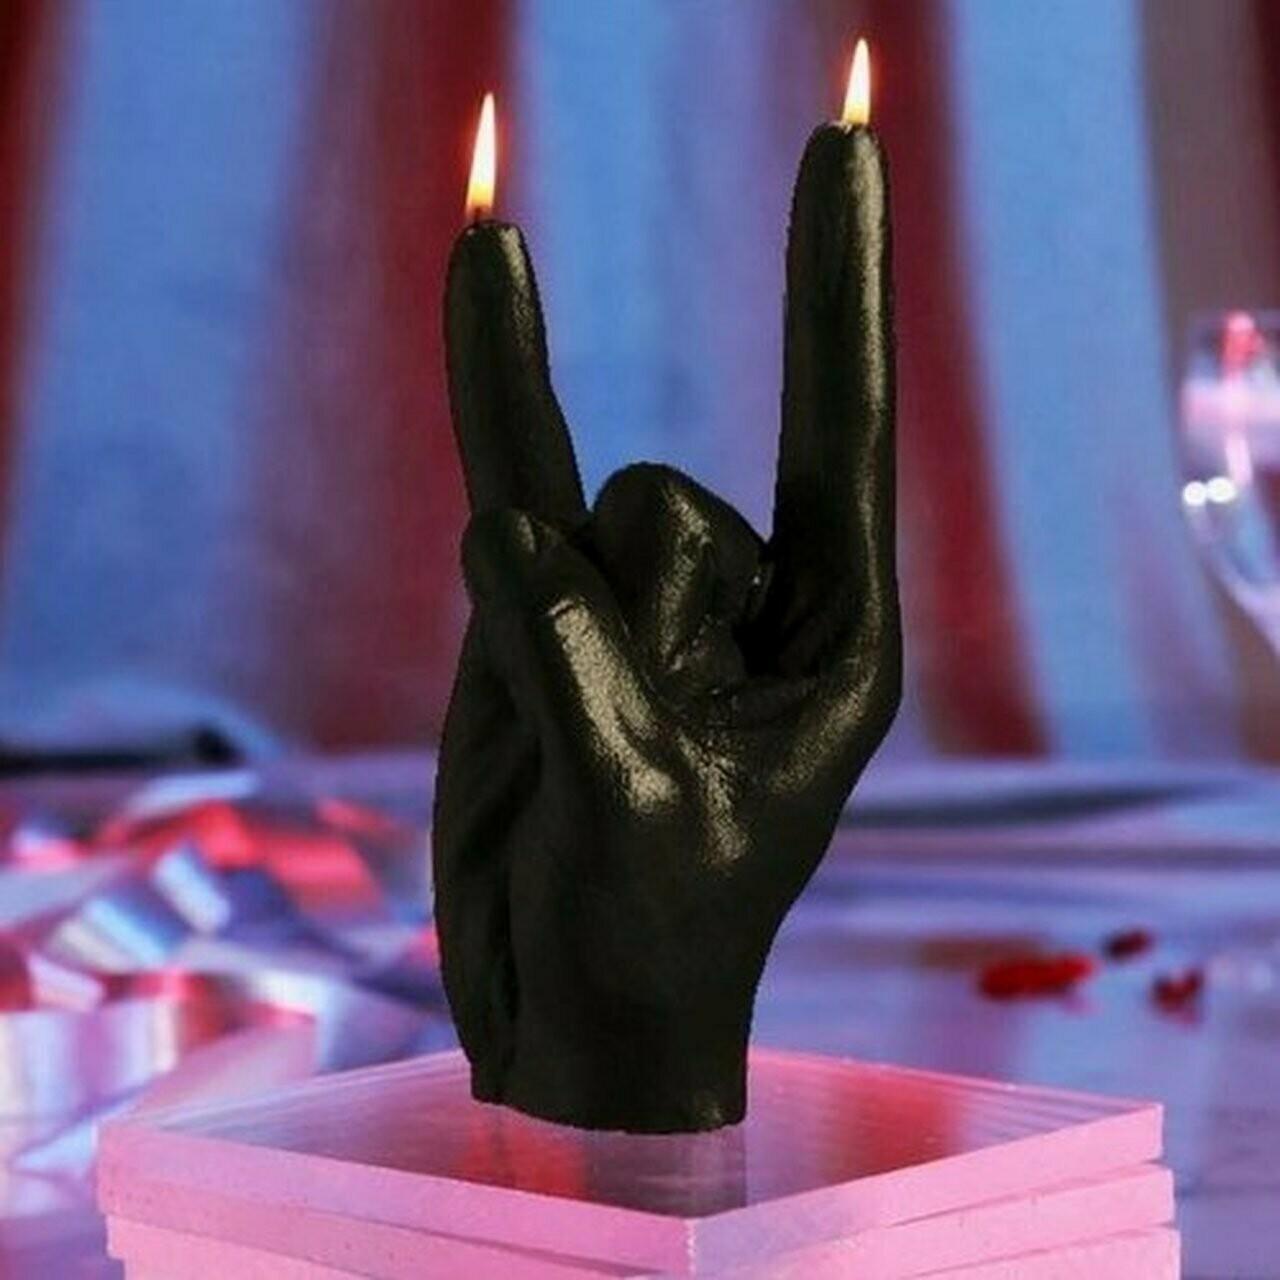 BOUGIE MAIN ROCK AND ROLL ATTITUDE noir métallique